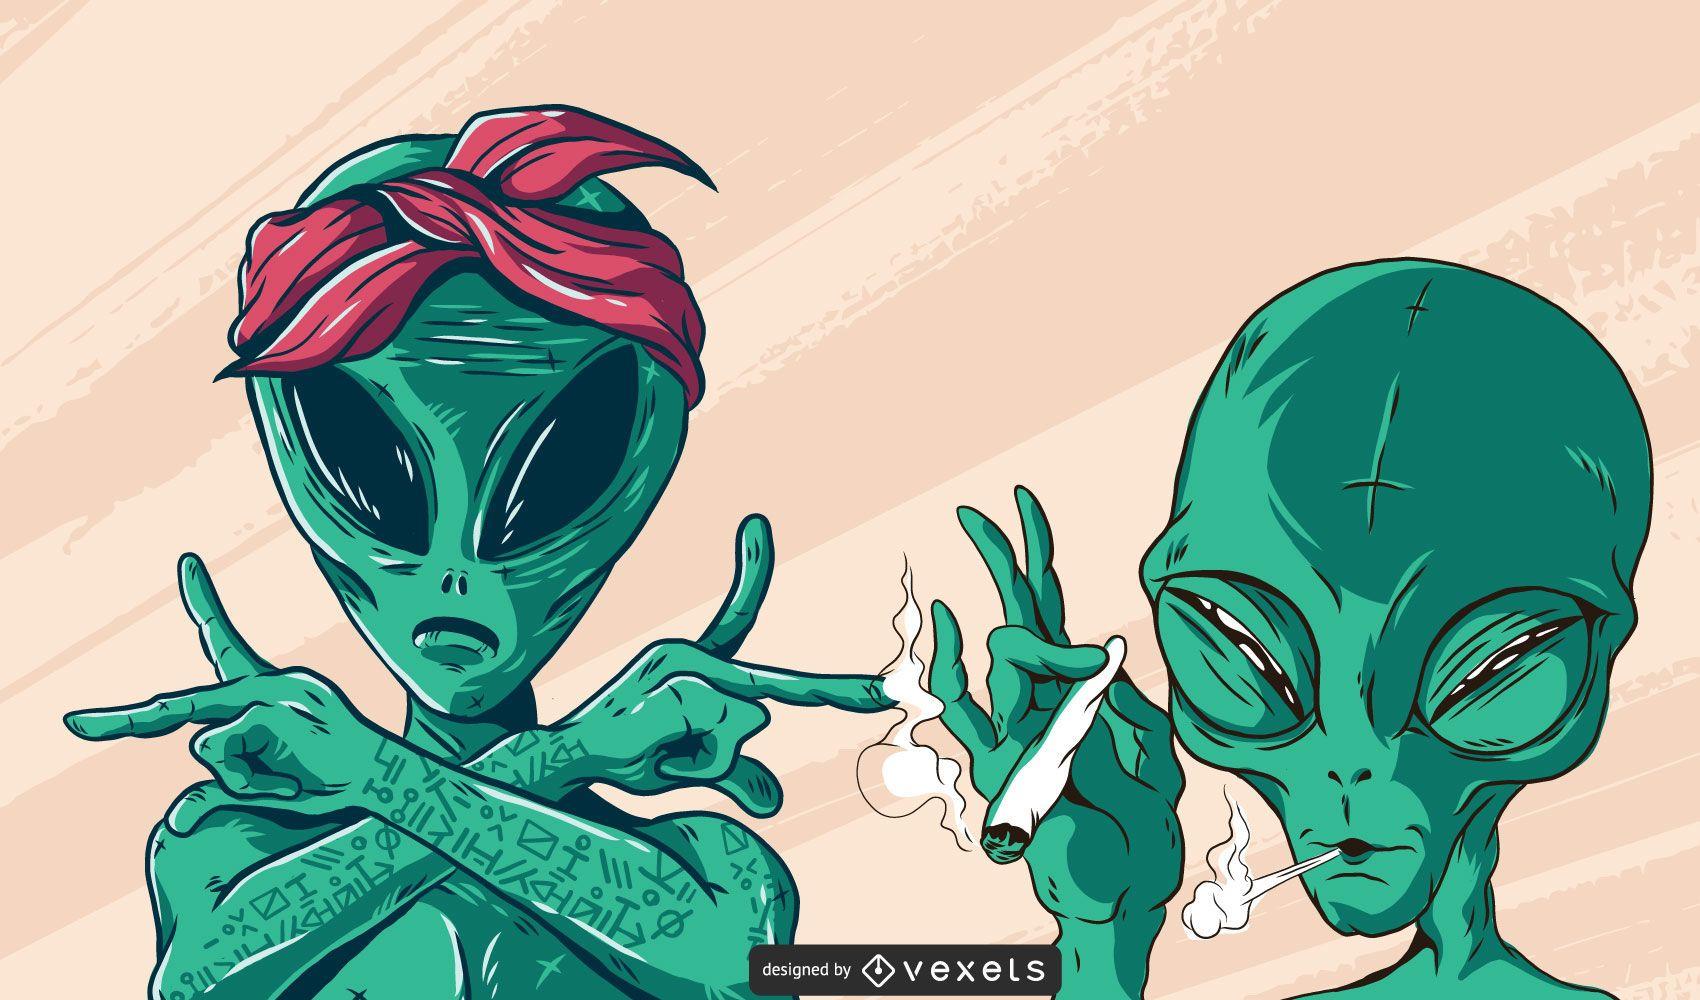 Cool Aliens